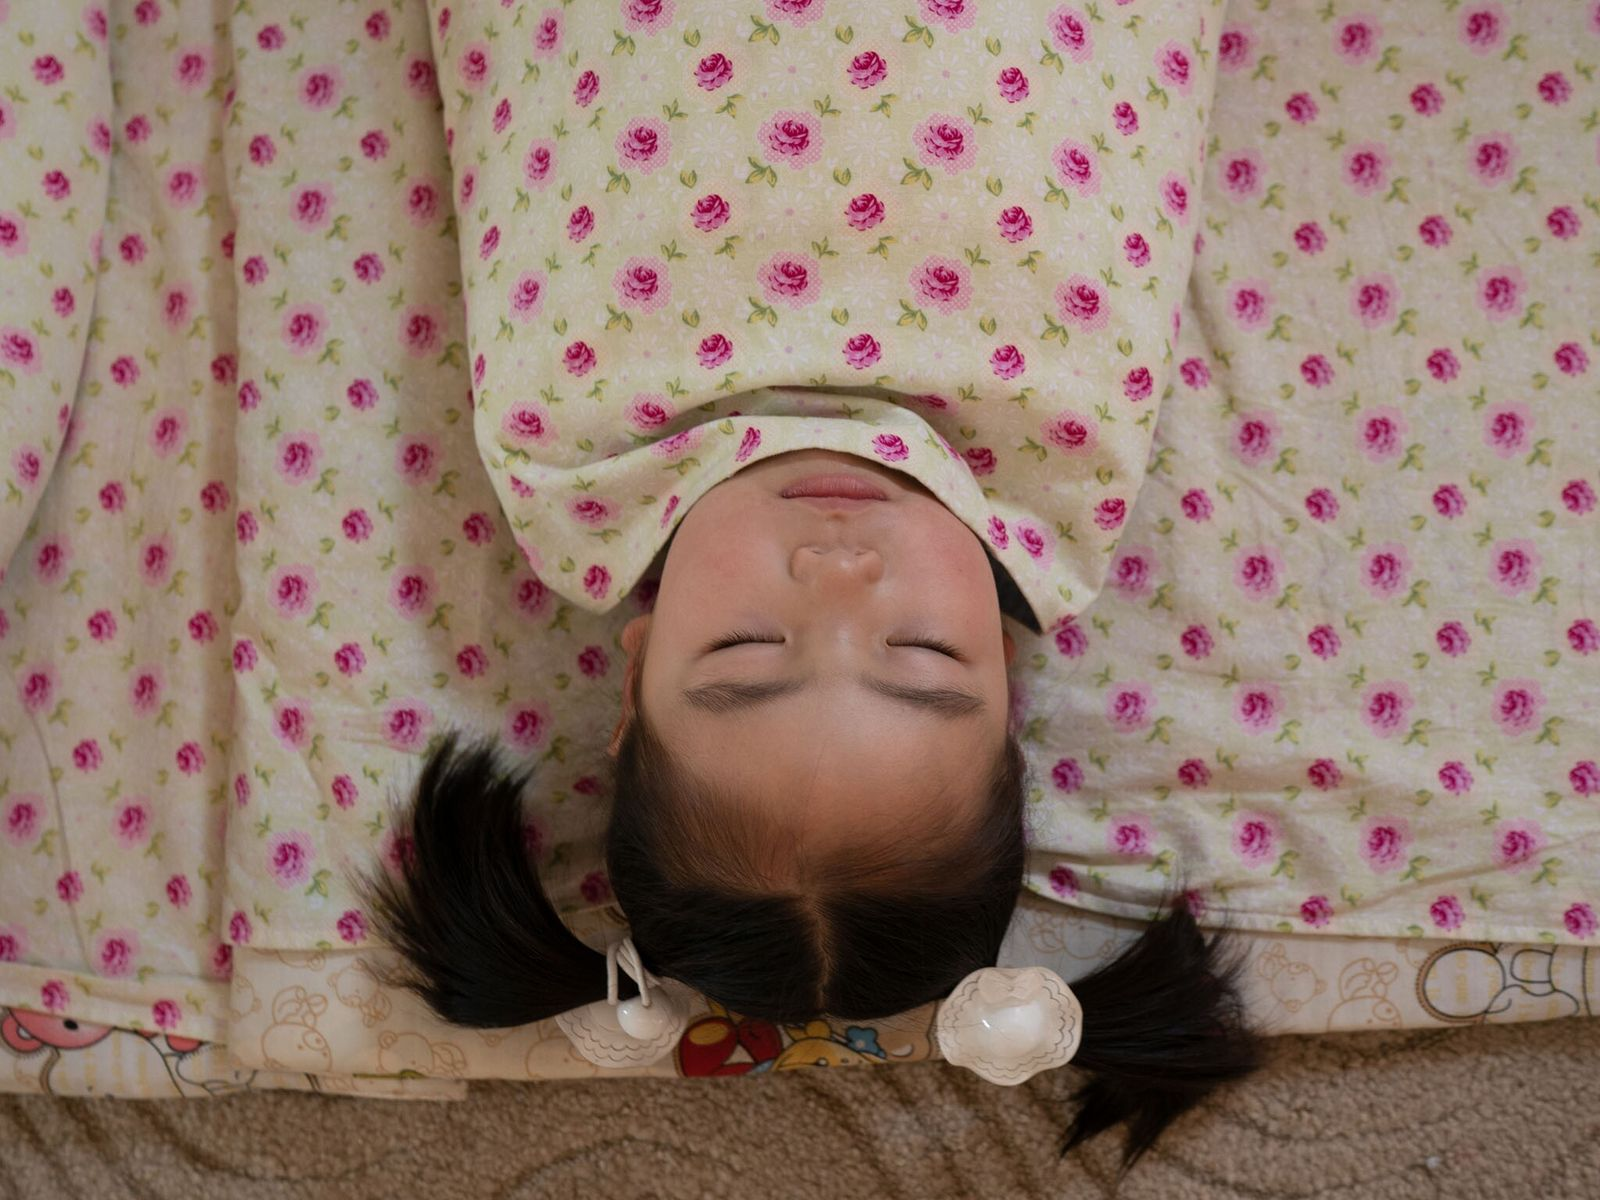 A swaddled child sleeps in Ulaanbaatar, Mongolia.